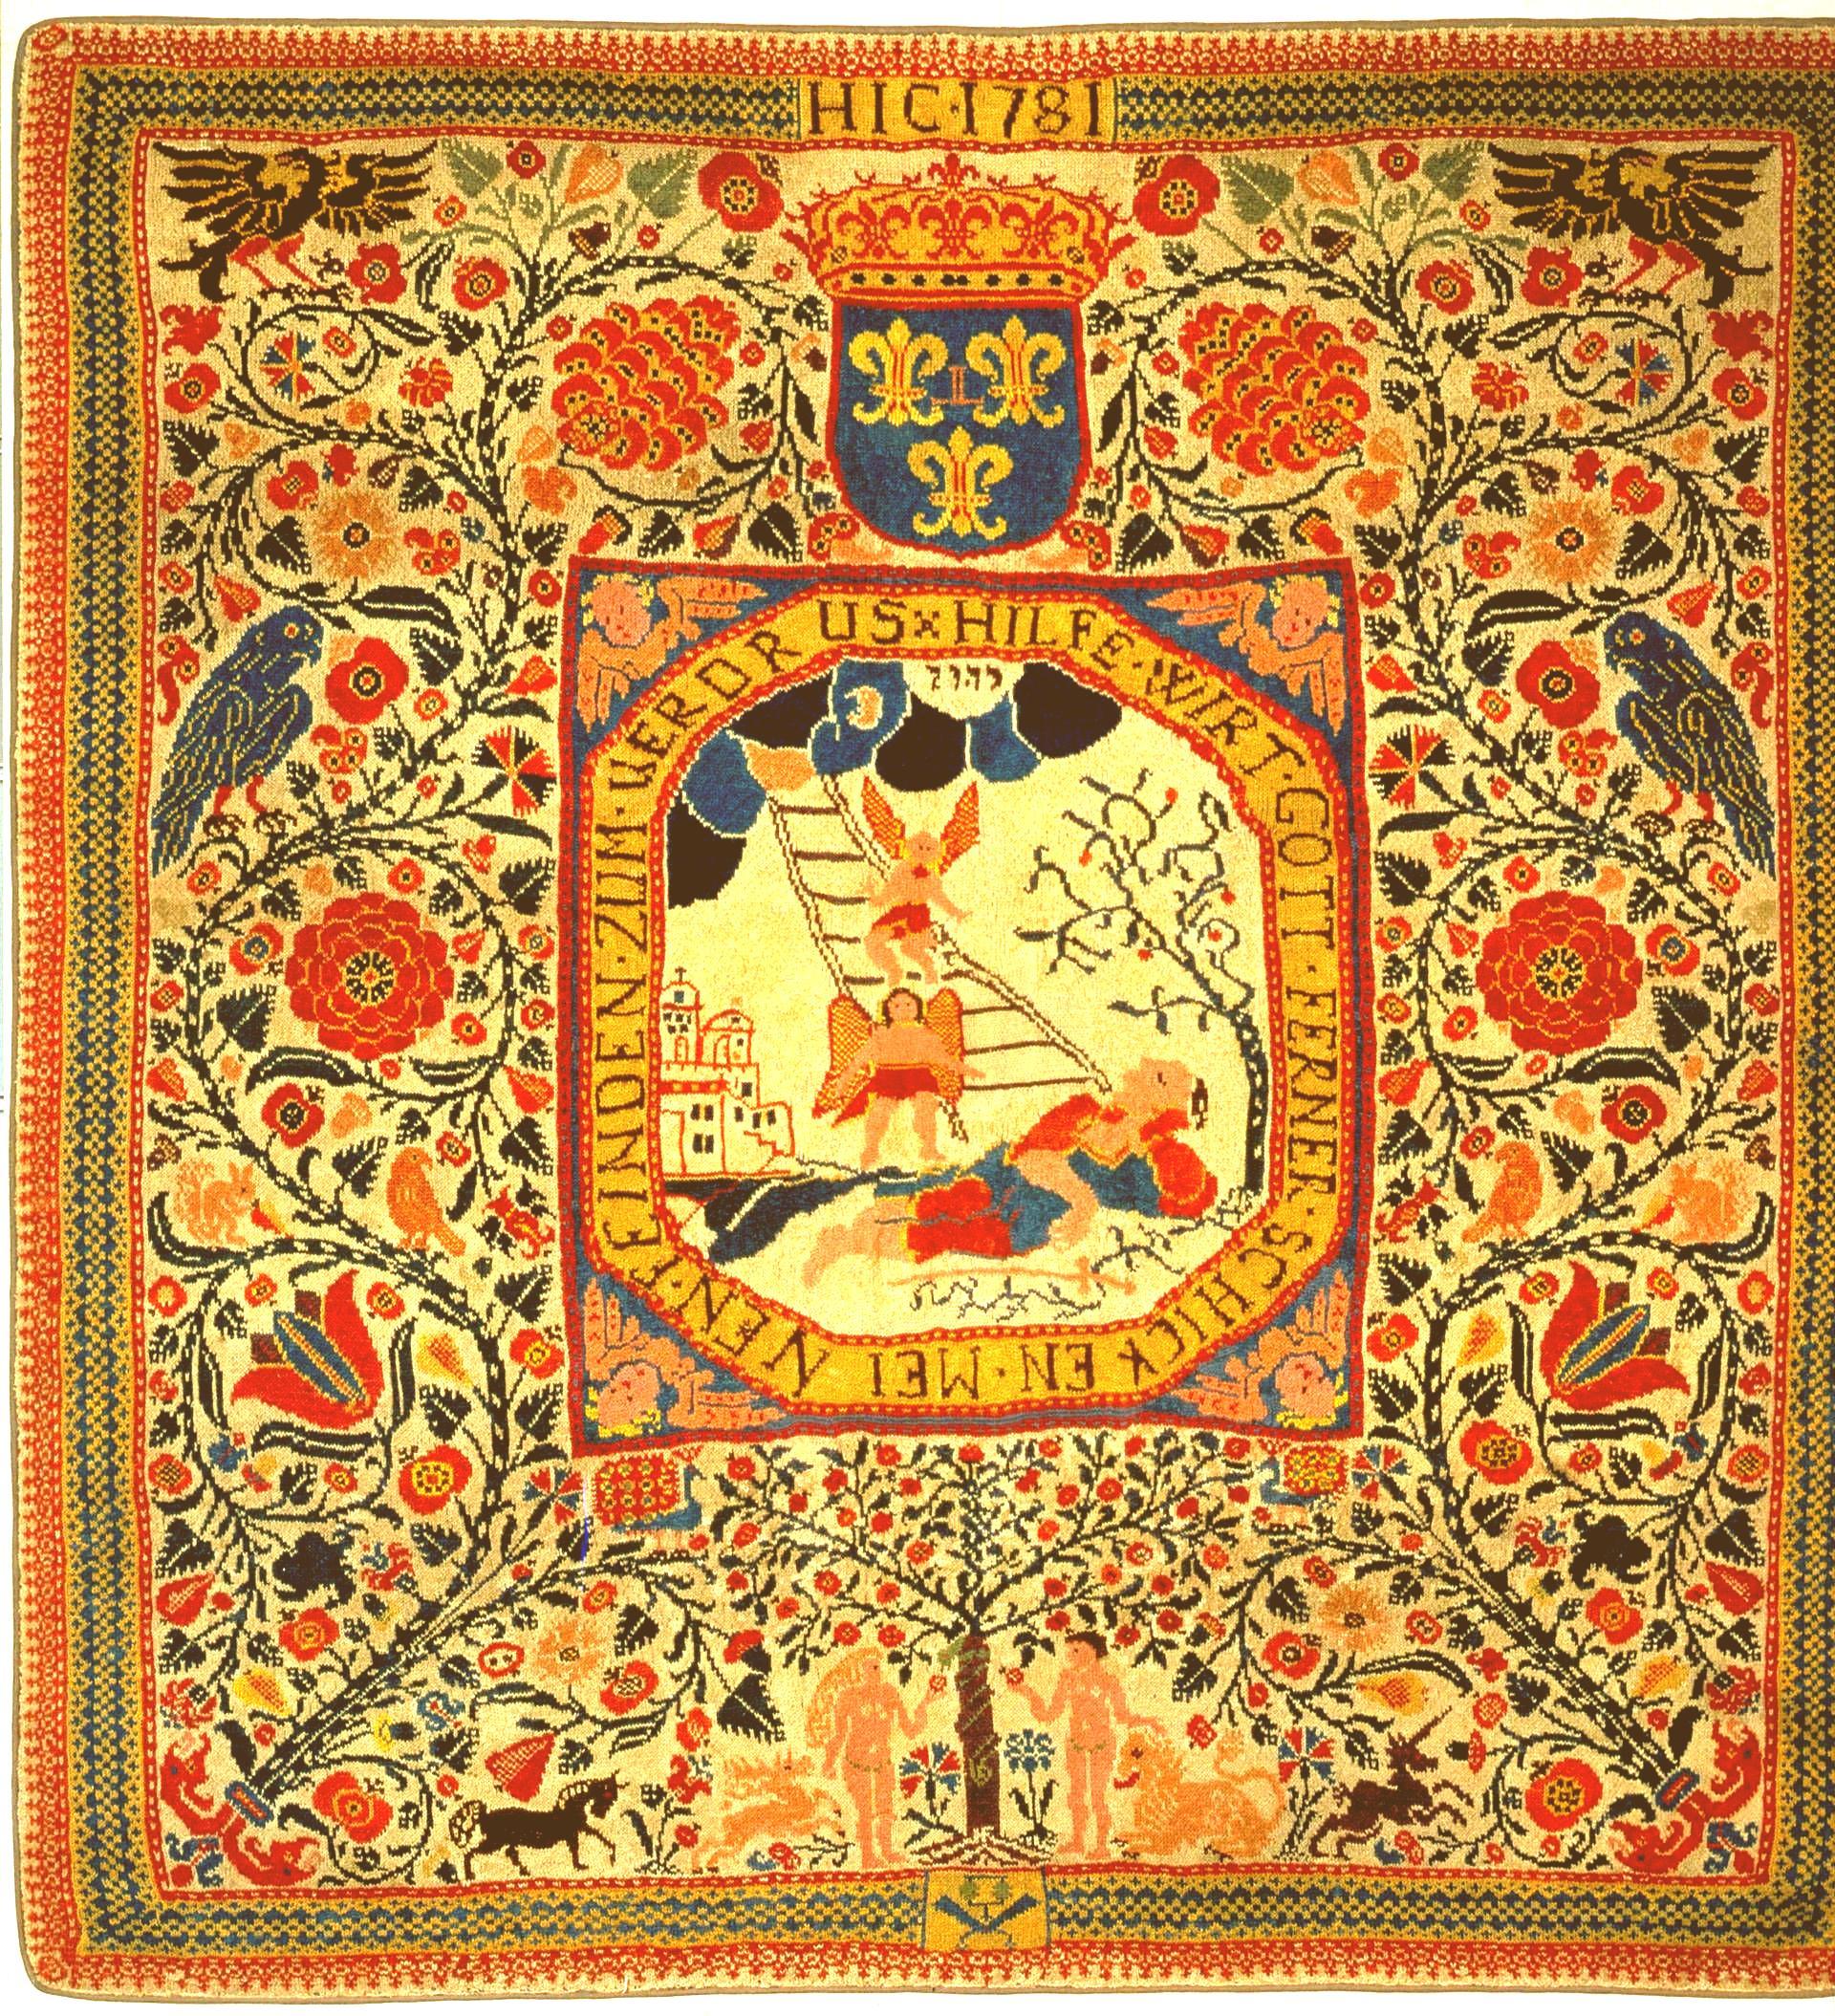 History of Hand Knitting